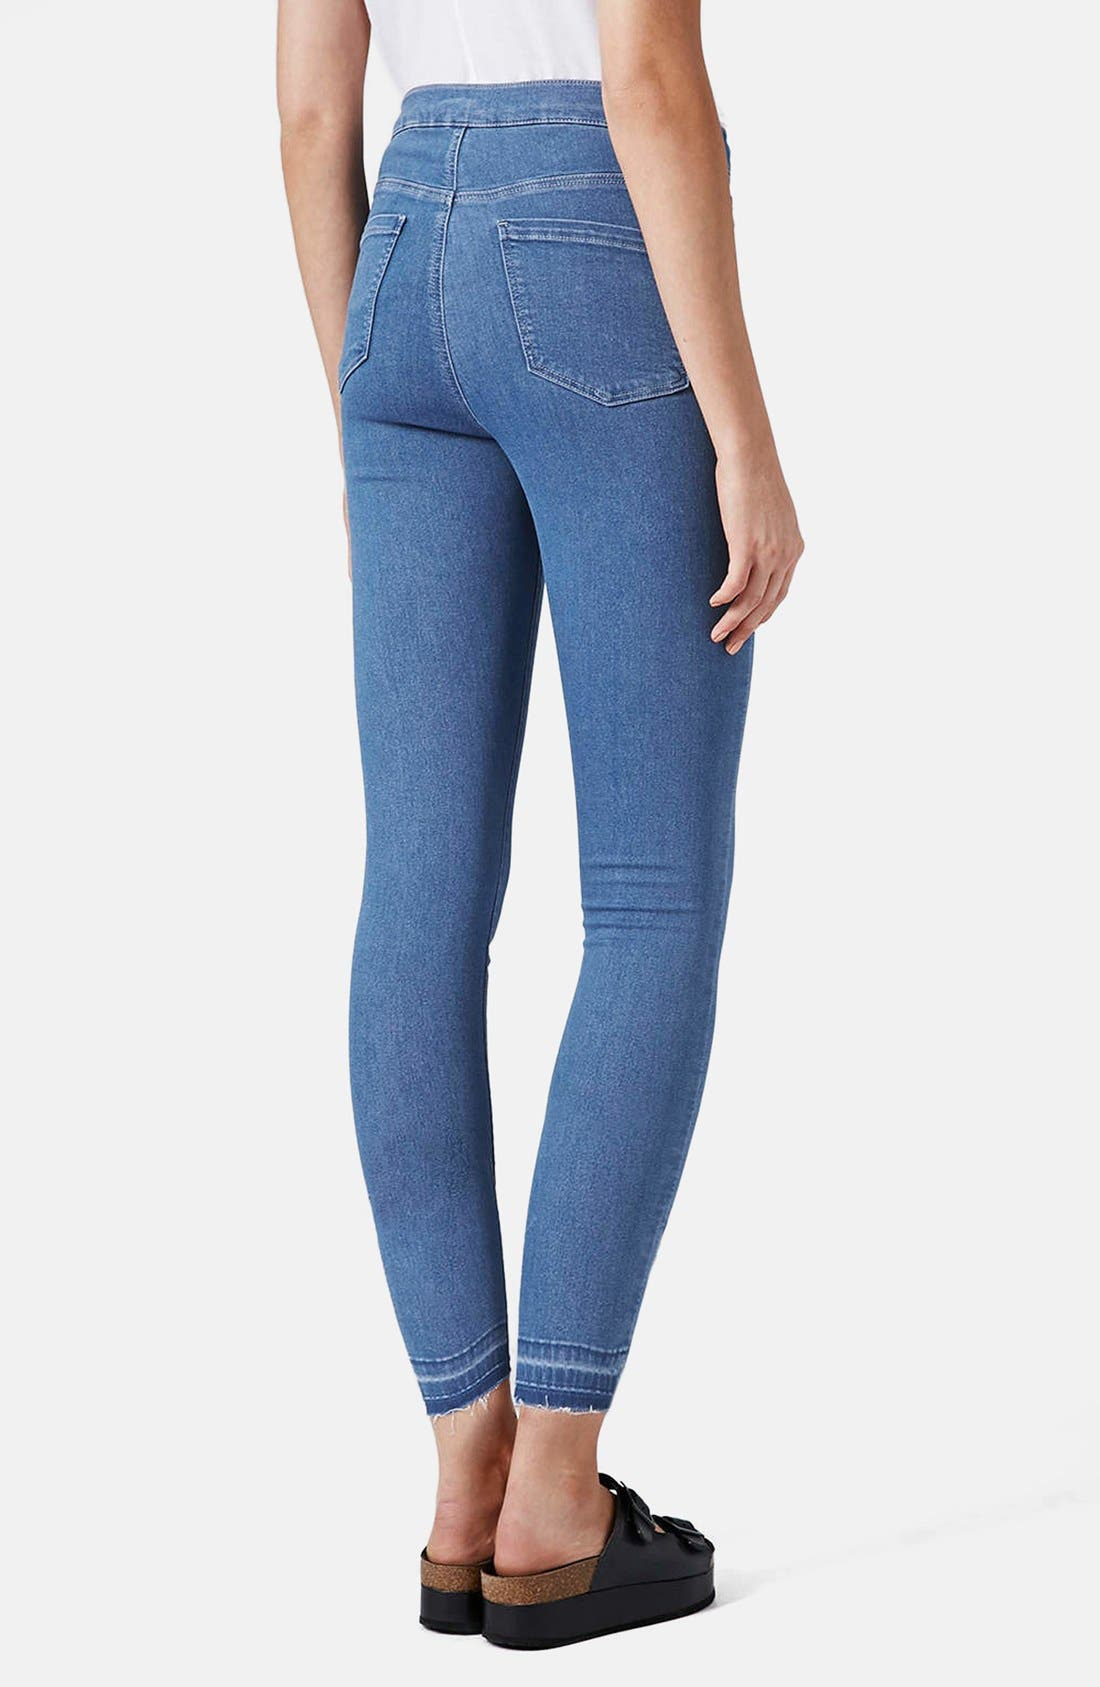 Alternate Image 2  - Topshop Moto 'Joni' High Rise Crop Skinny Jeans (Light)